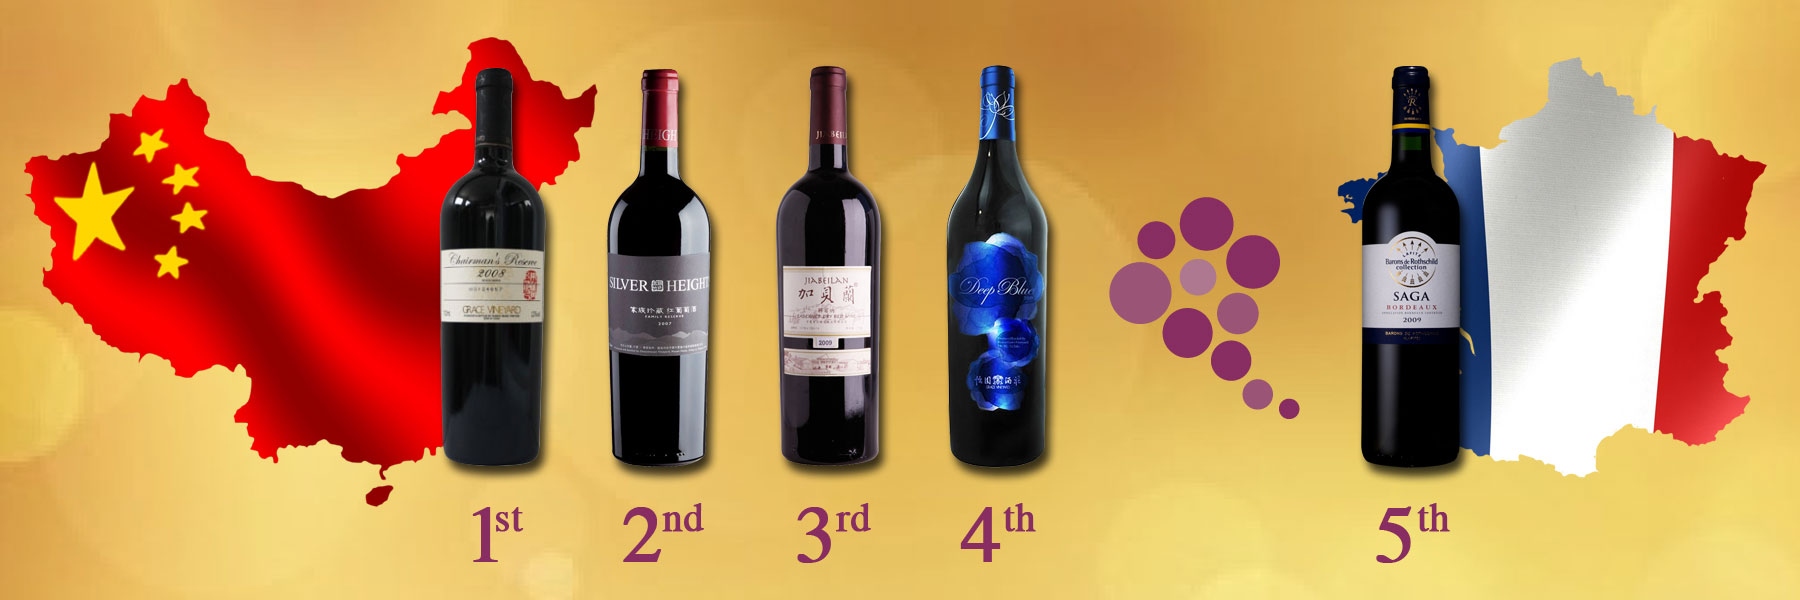 Chinese Wine – Bordeaux vs. Ningxia